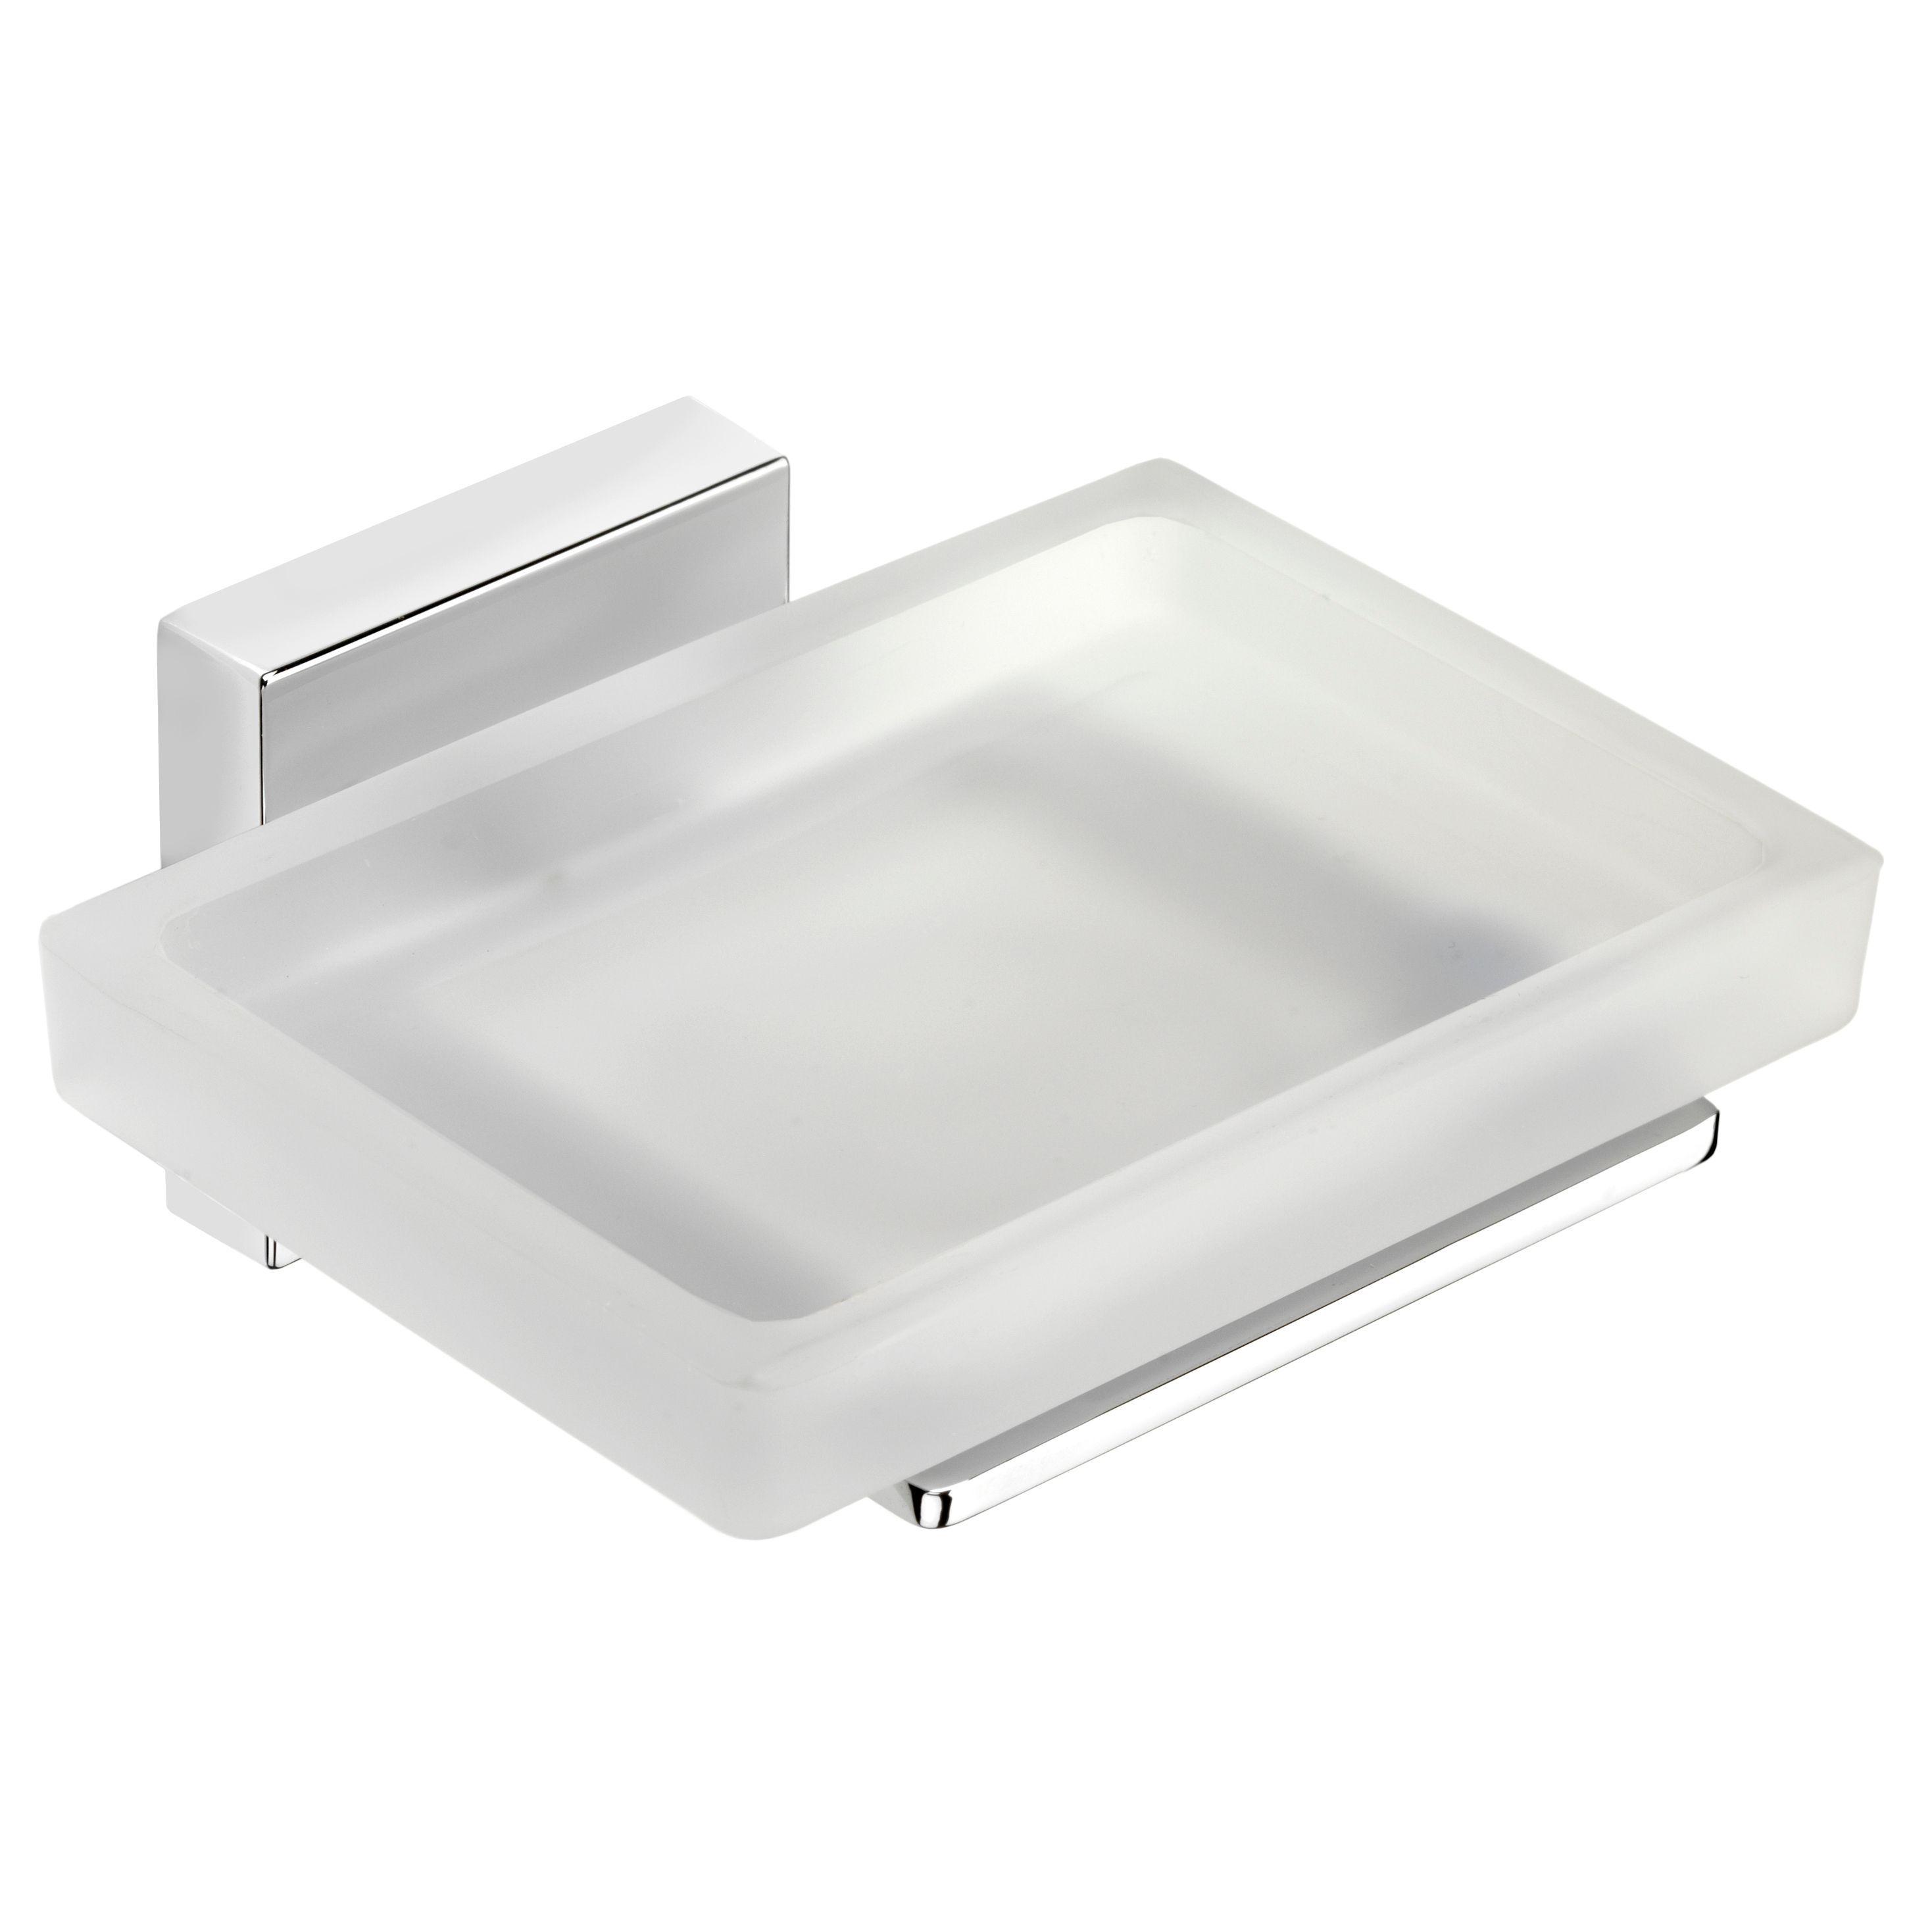 Croydex Flexi-fix Flexi Fix Cheadle Chrome Wall Mounted Soap Dish & Holder